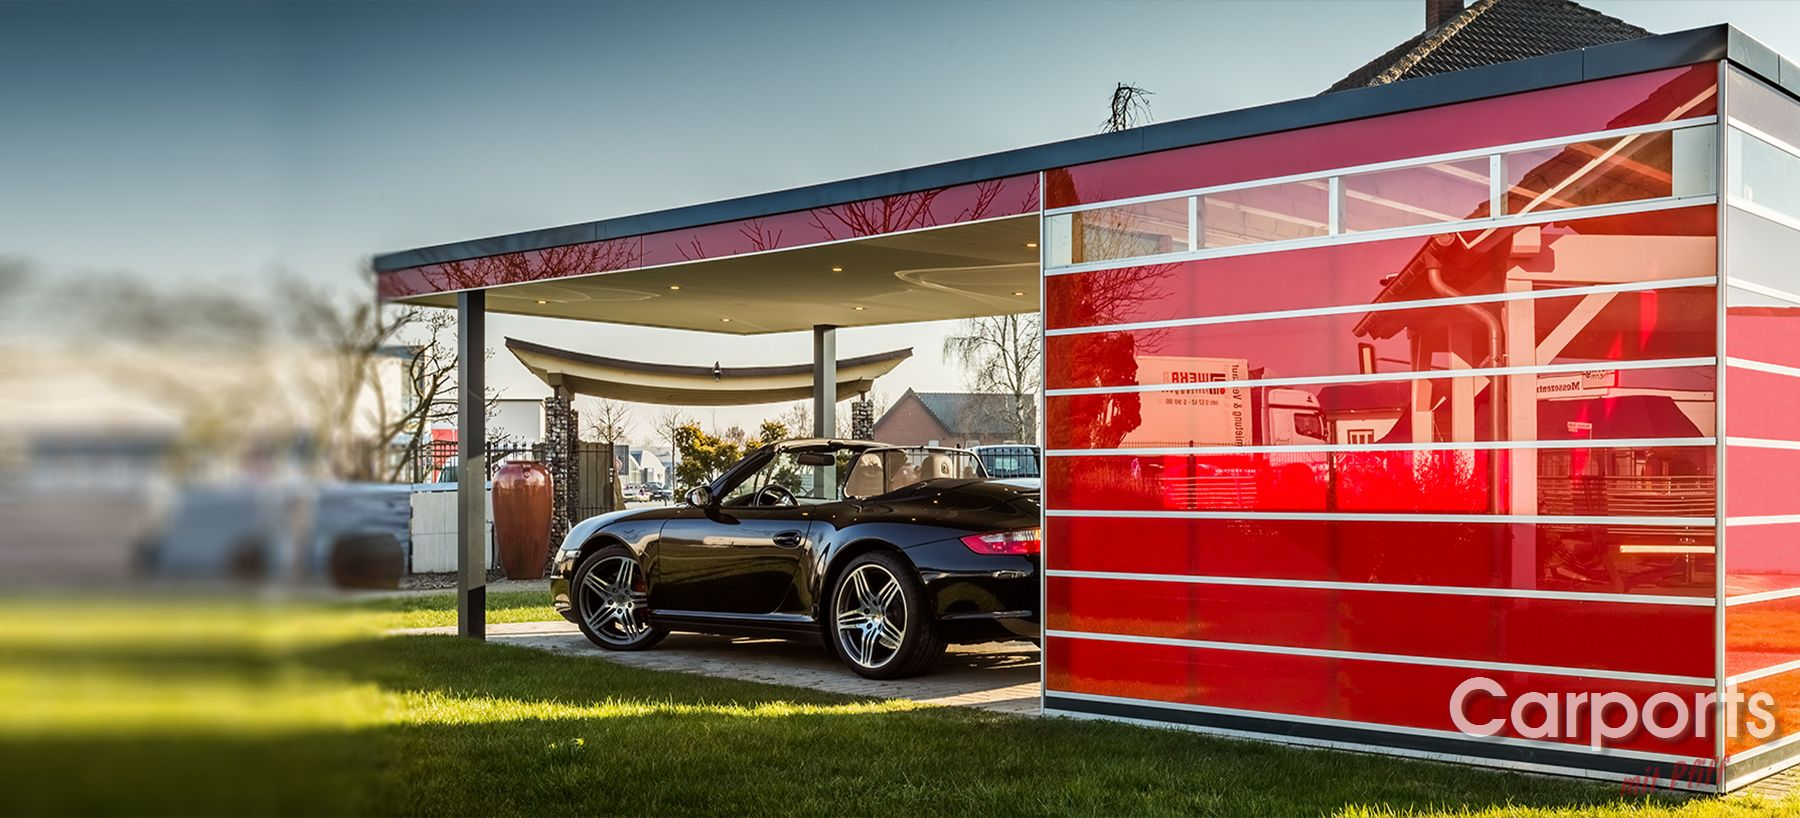 Carport Enzo Porsche